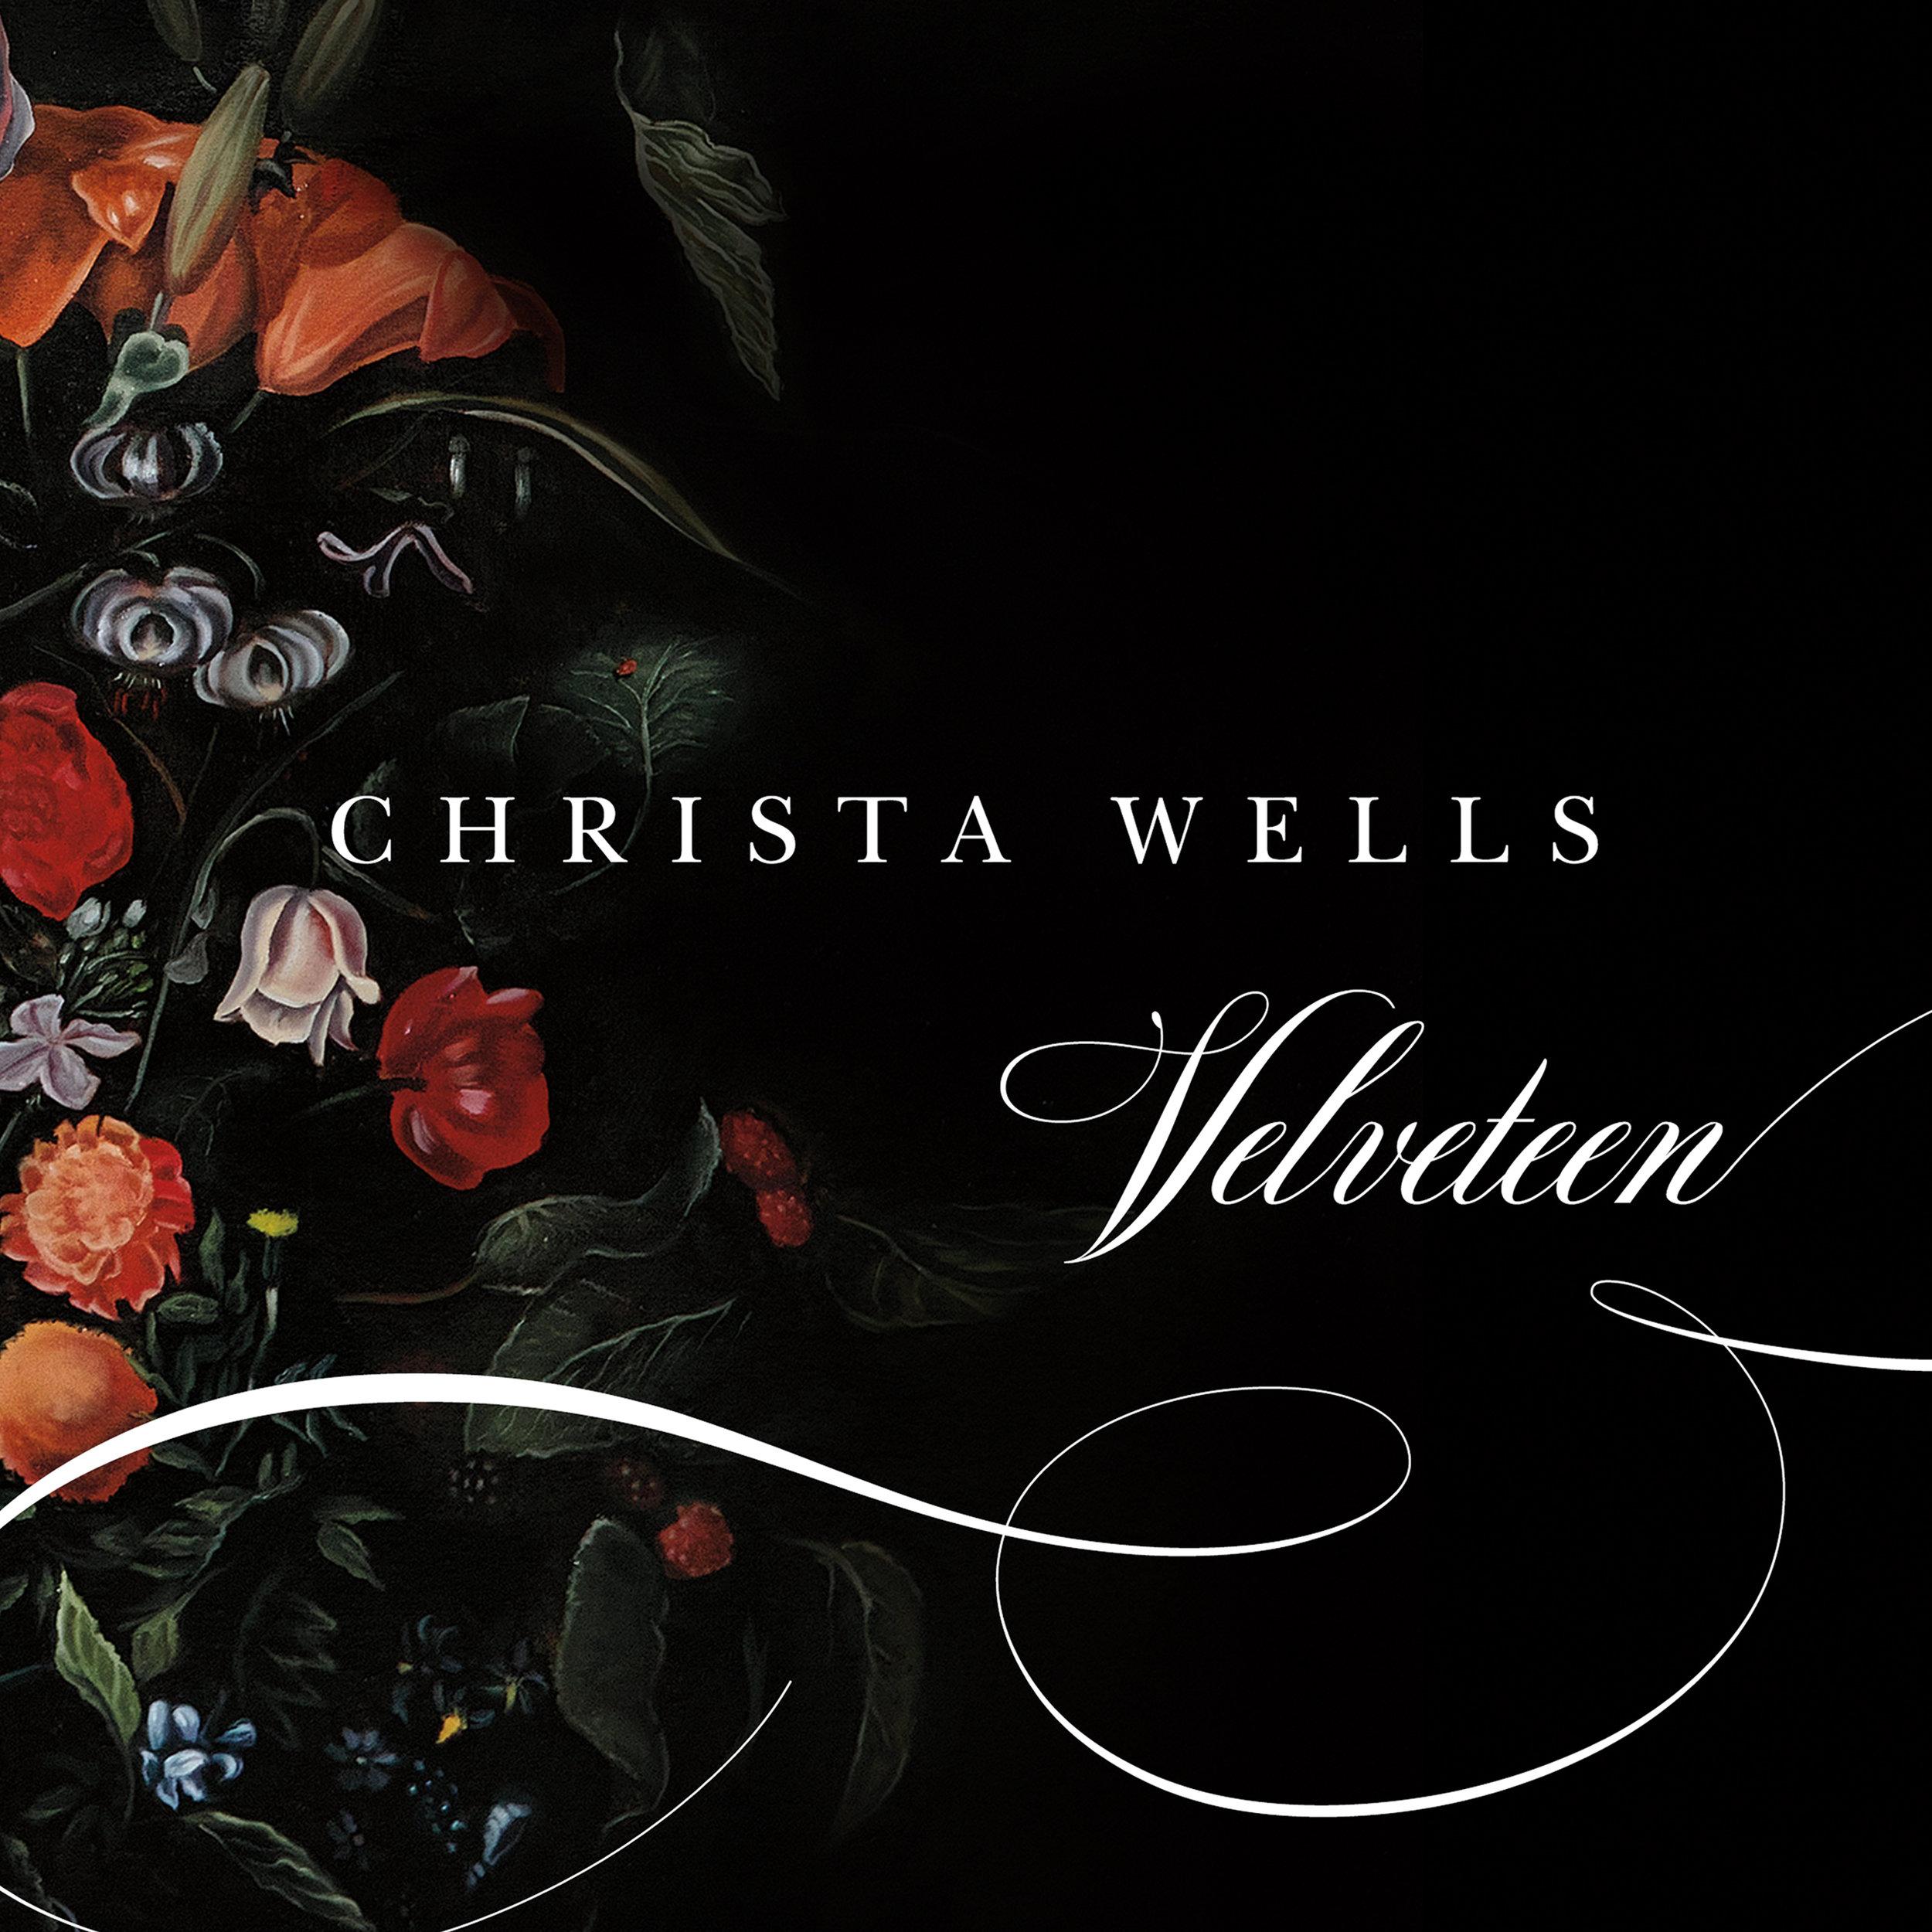 Blog — Christa Wells